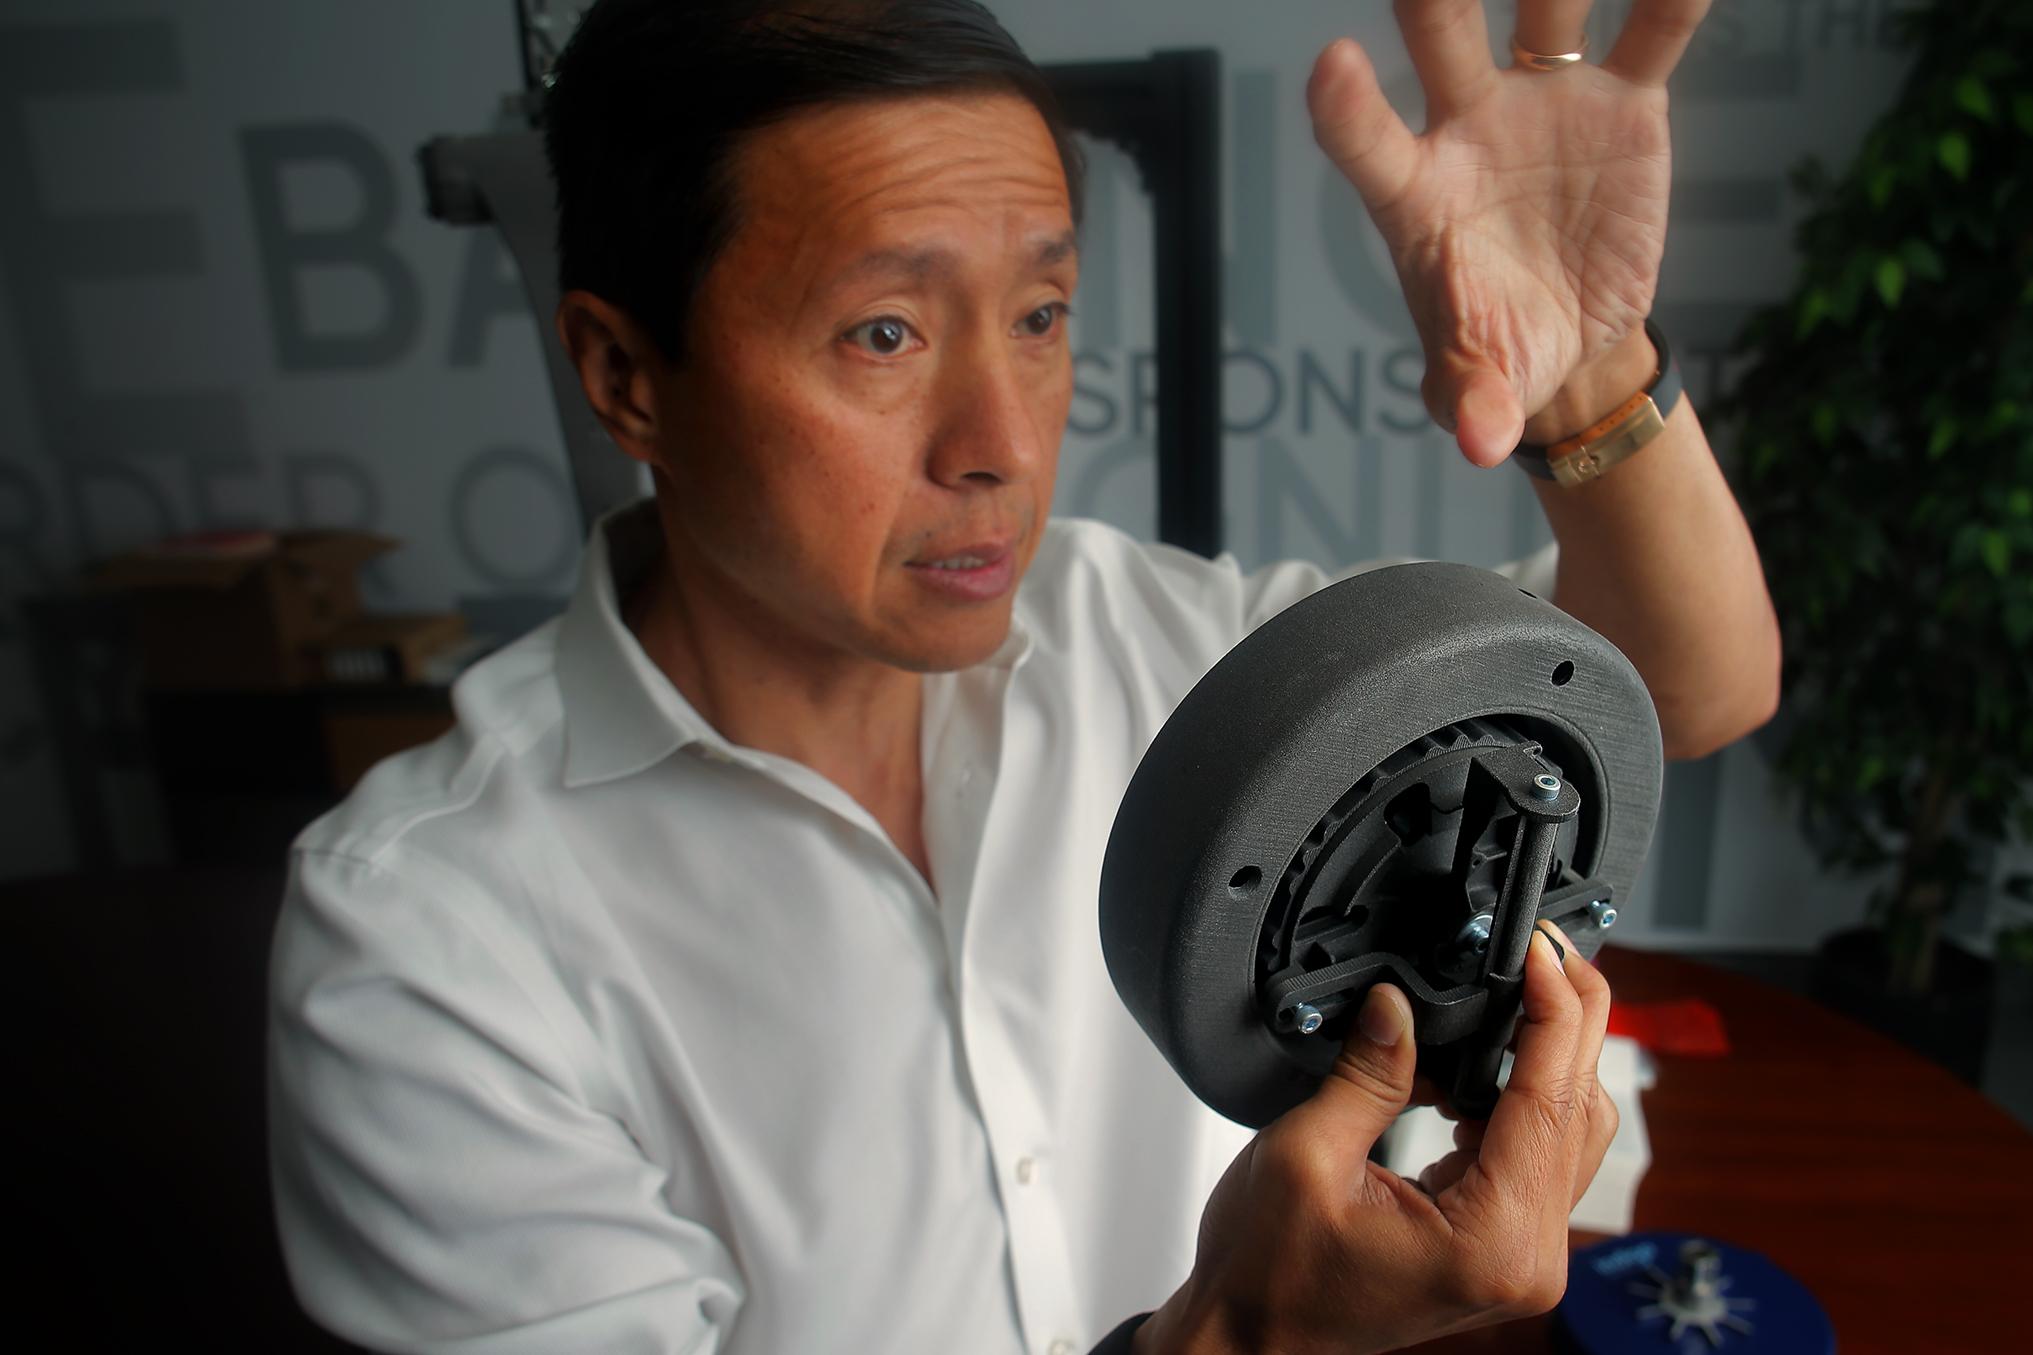 Indigo CEO Will Graylin shows a model of the motorized wheel.